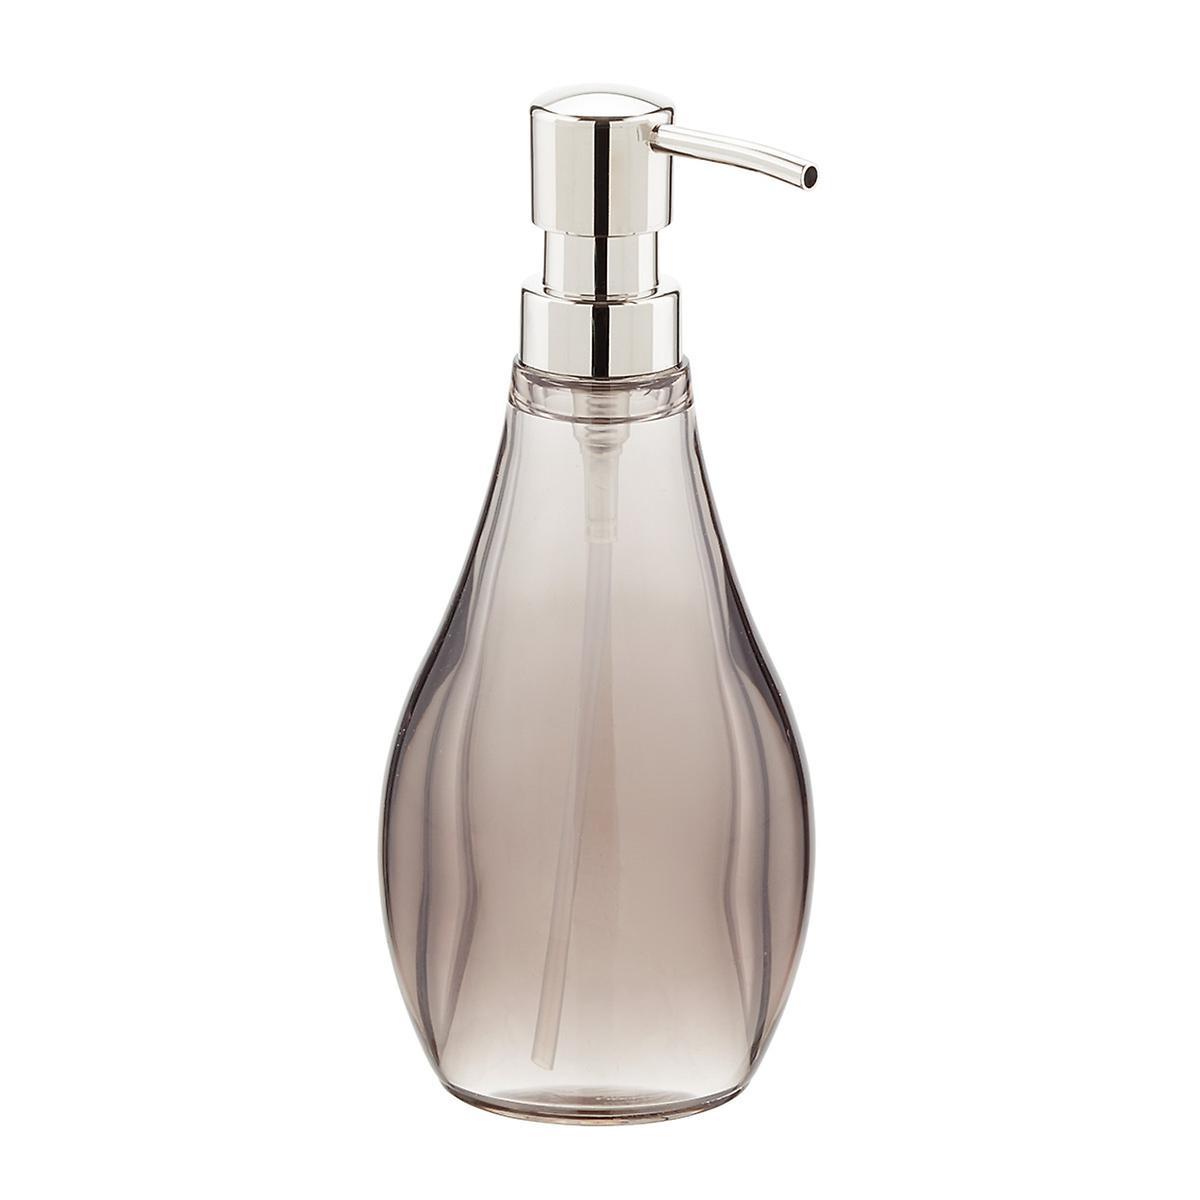 Umbra smoke droplet acrylic countertop bathroom set the for Bathroom countertop accessories sets